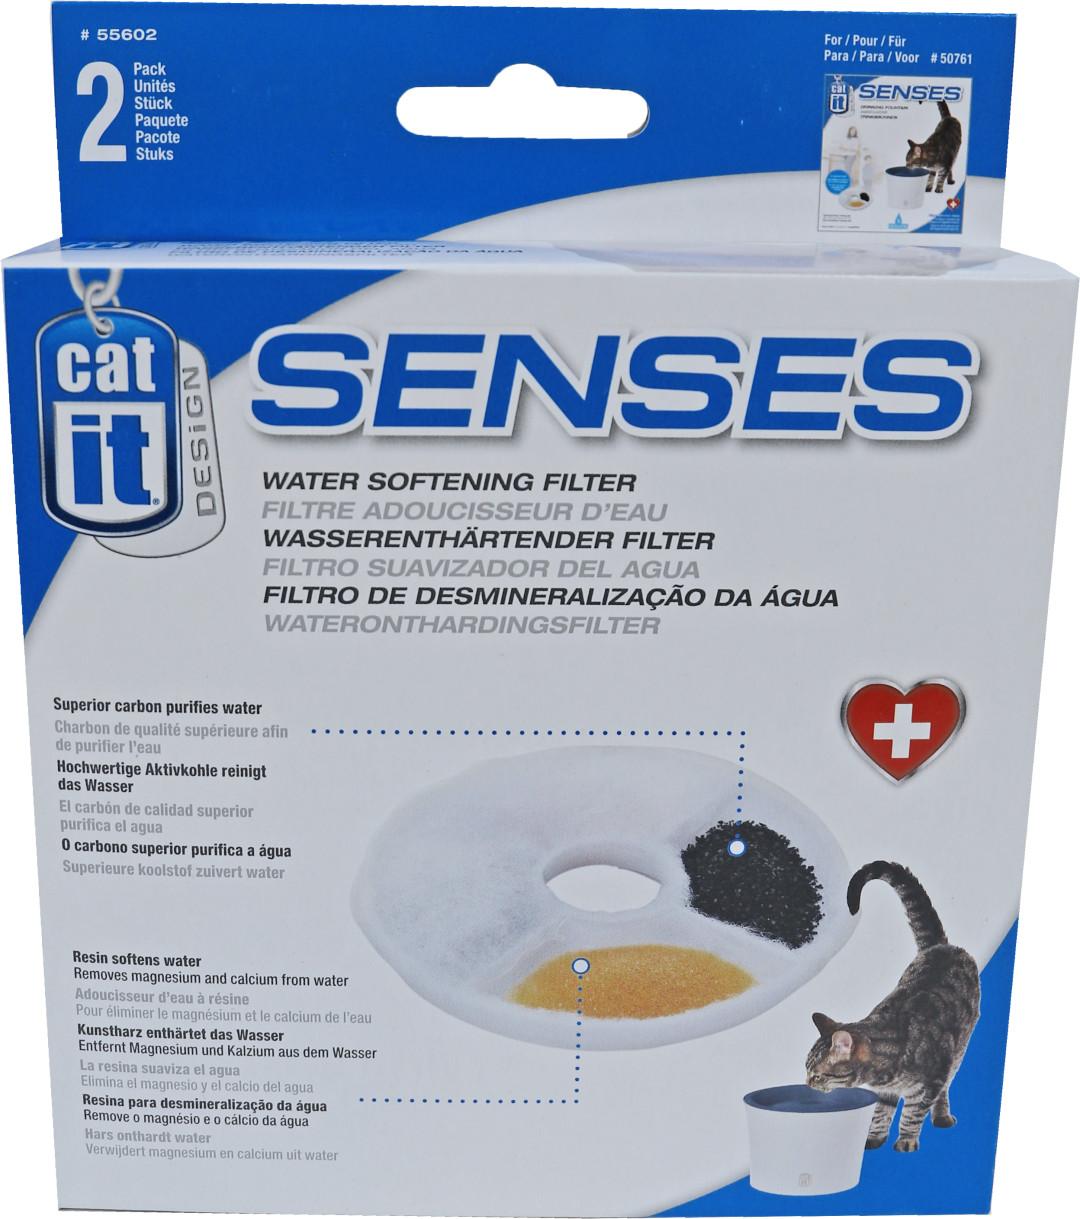 Catit Design Senses wateronthardingsfilter <br>2 st